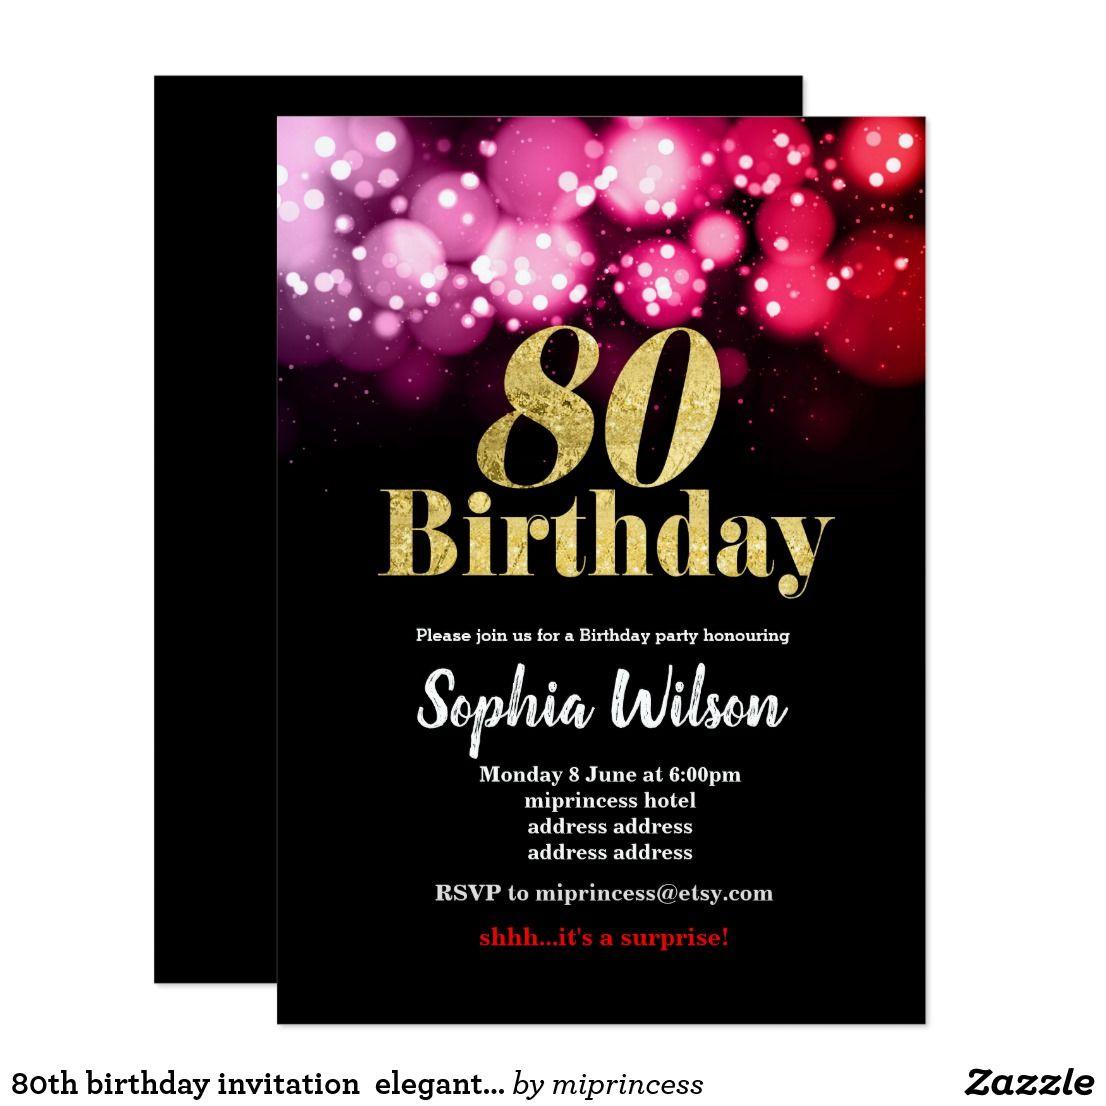 80th birthday invitation elegant glitter pink red Fun birthday party ...